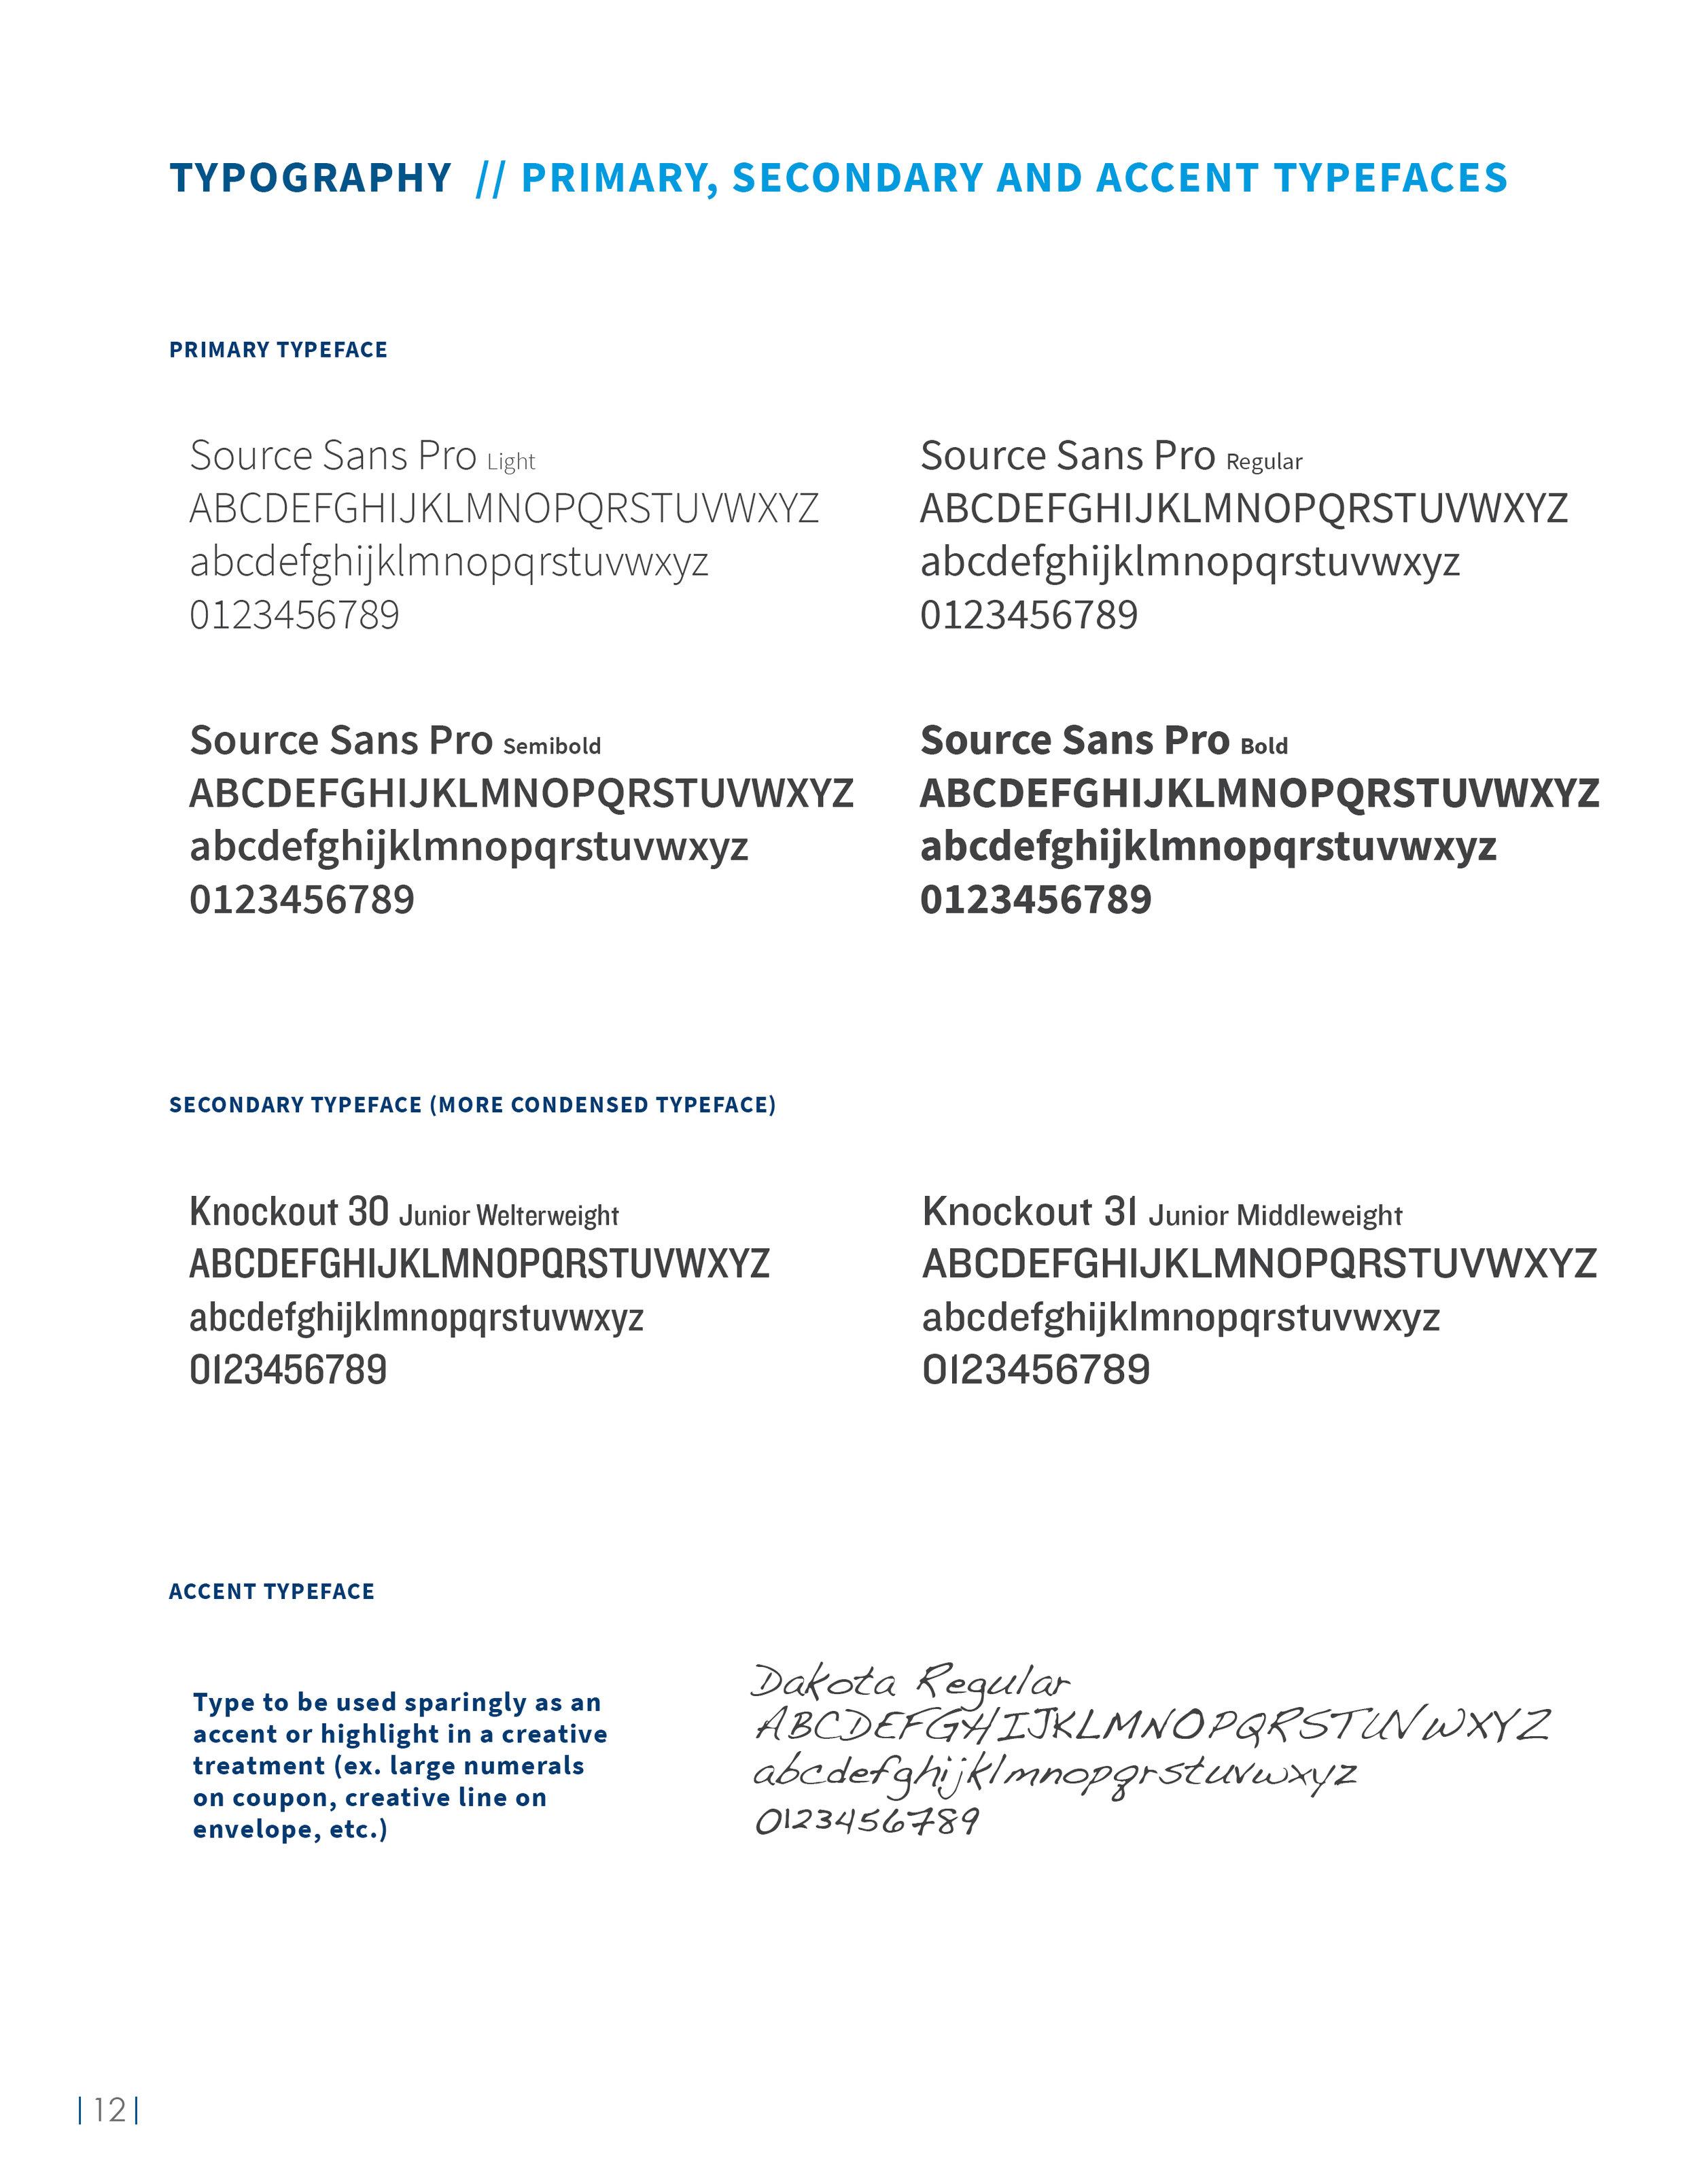 apparel-company-brand-guidelines-design-by-jordan-fretz-design-112.jpg